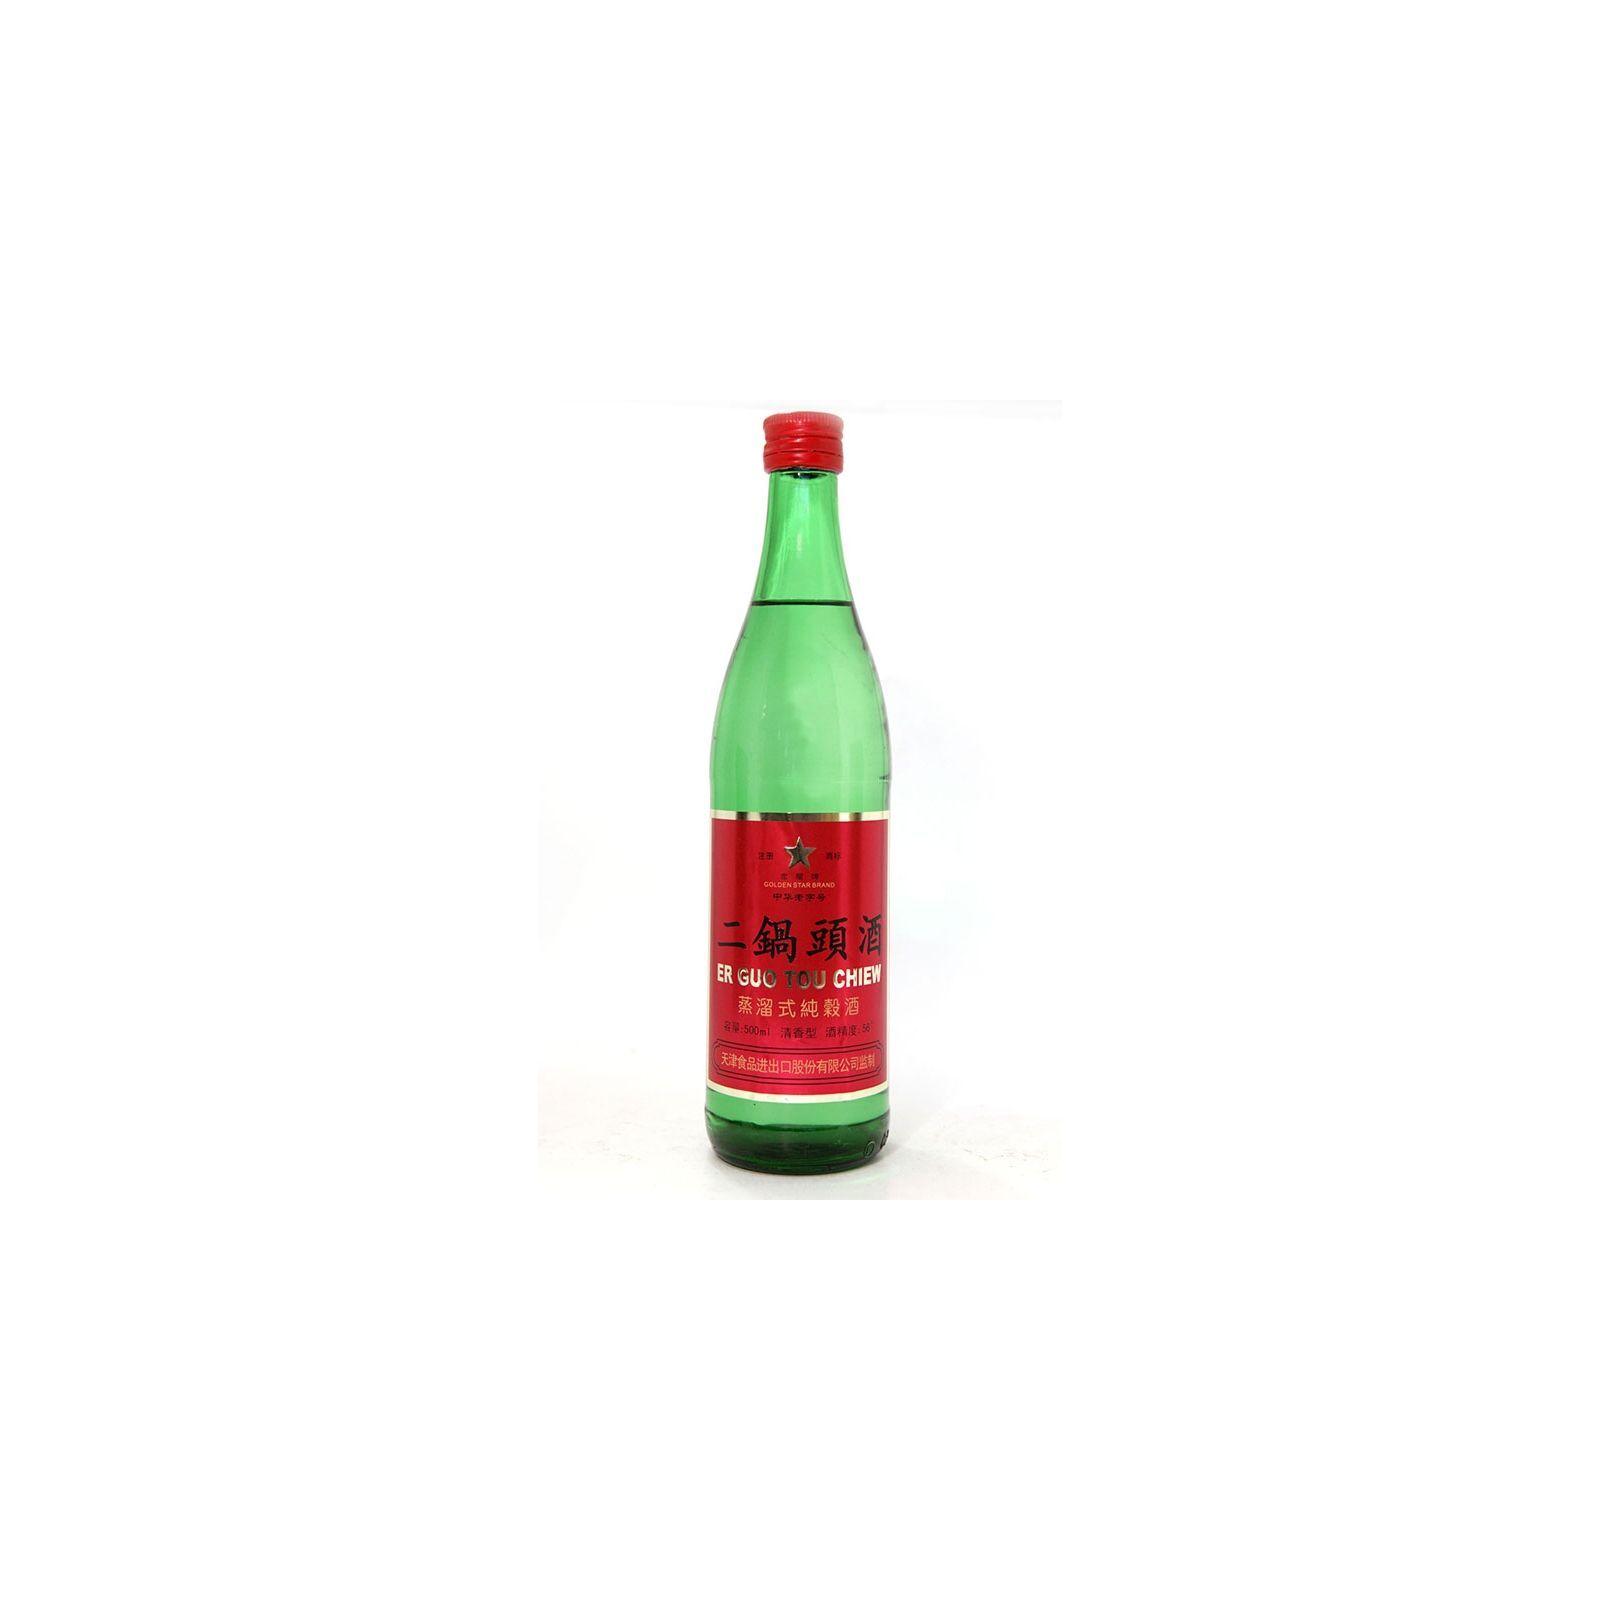 Asia Marché Alcool de Sorgho,  二鍋頭 50cl (56°)